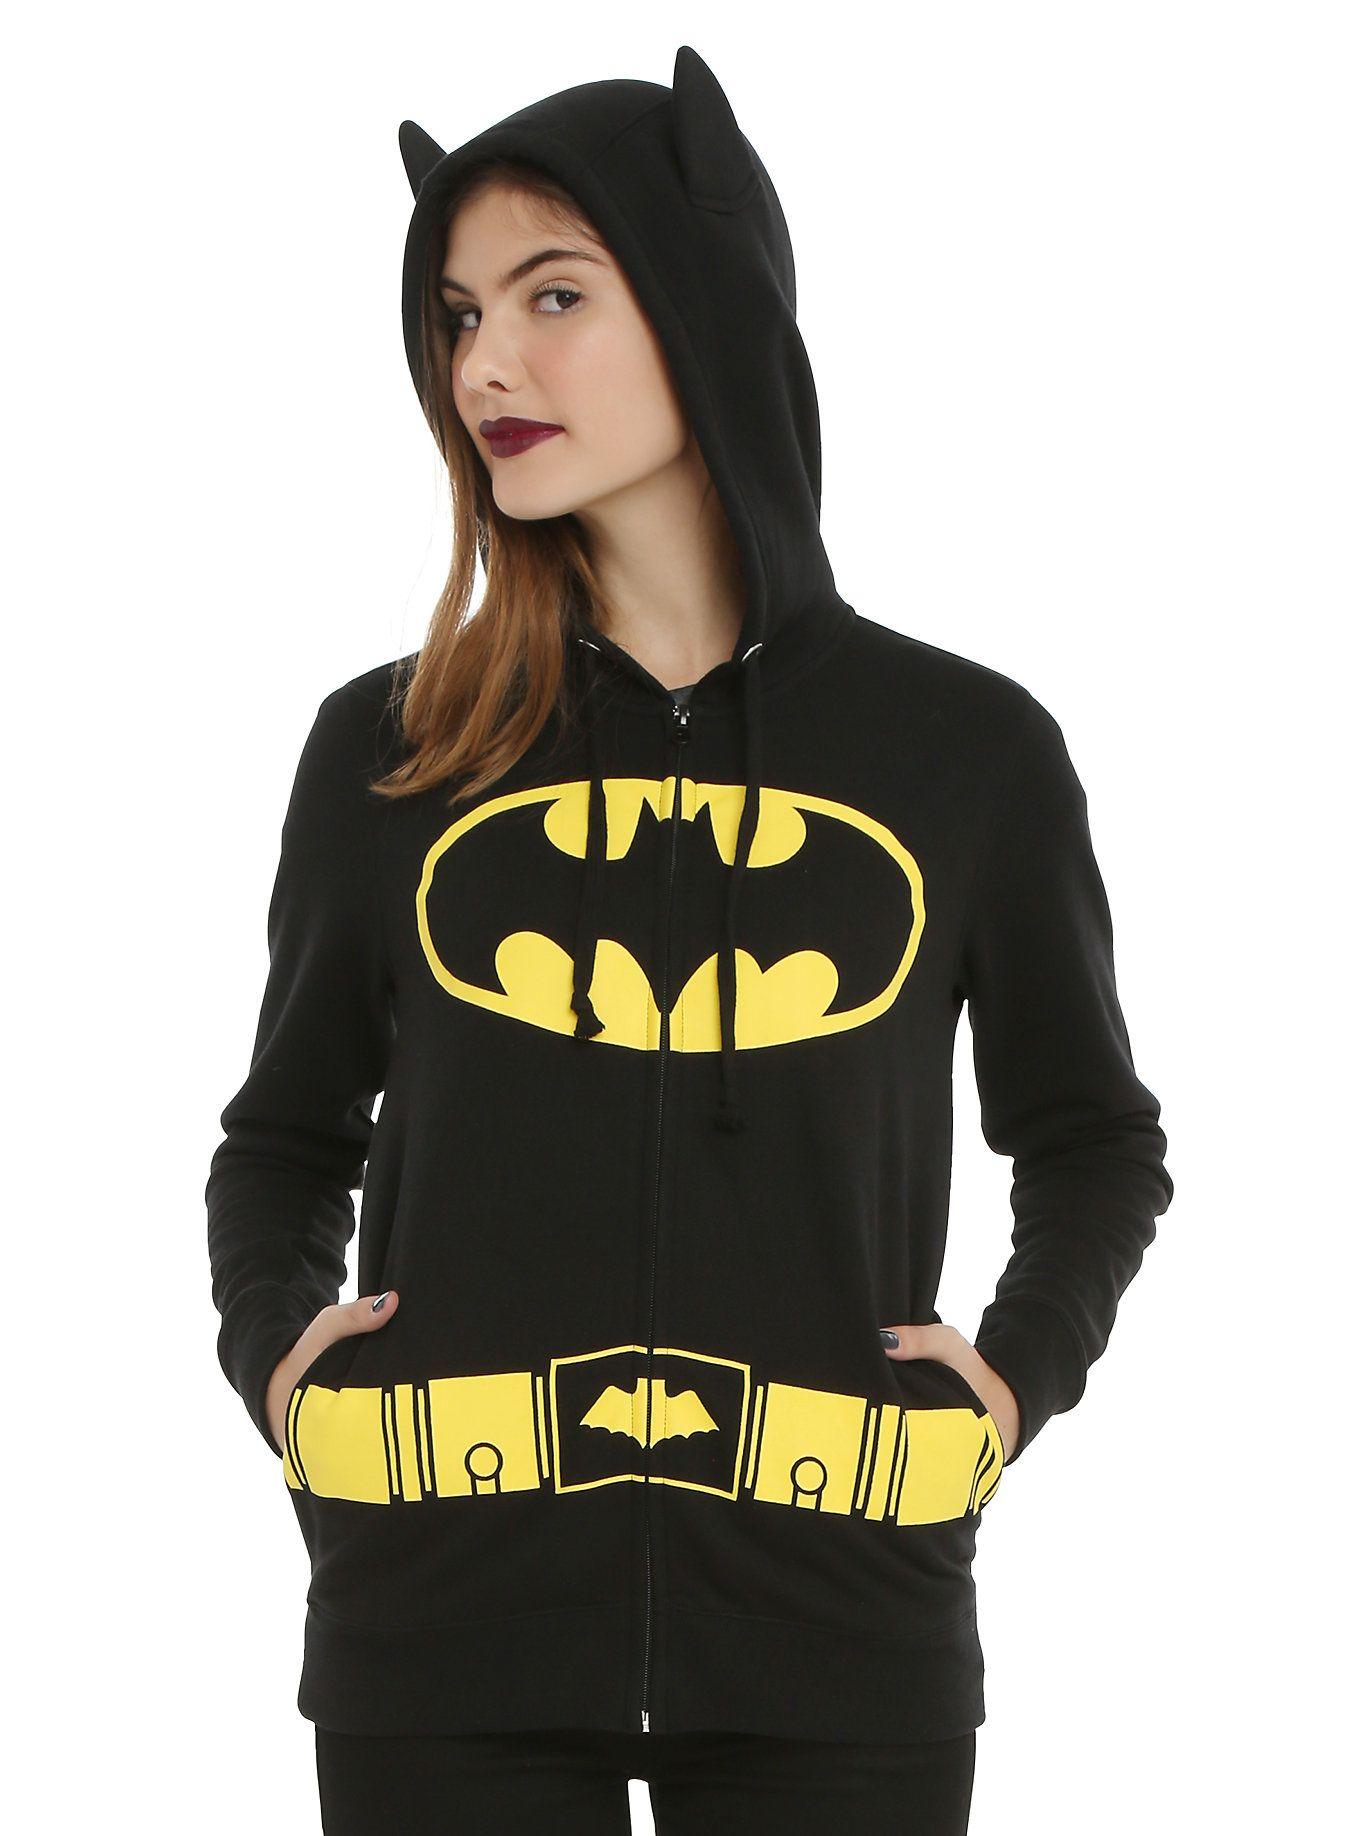 Dc comics batman girls costume hoodie batman hoodie